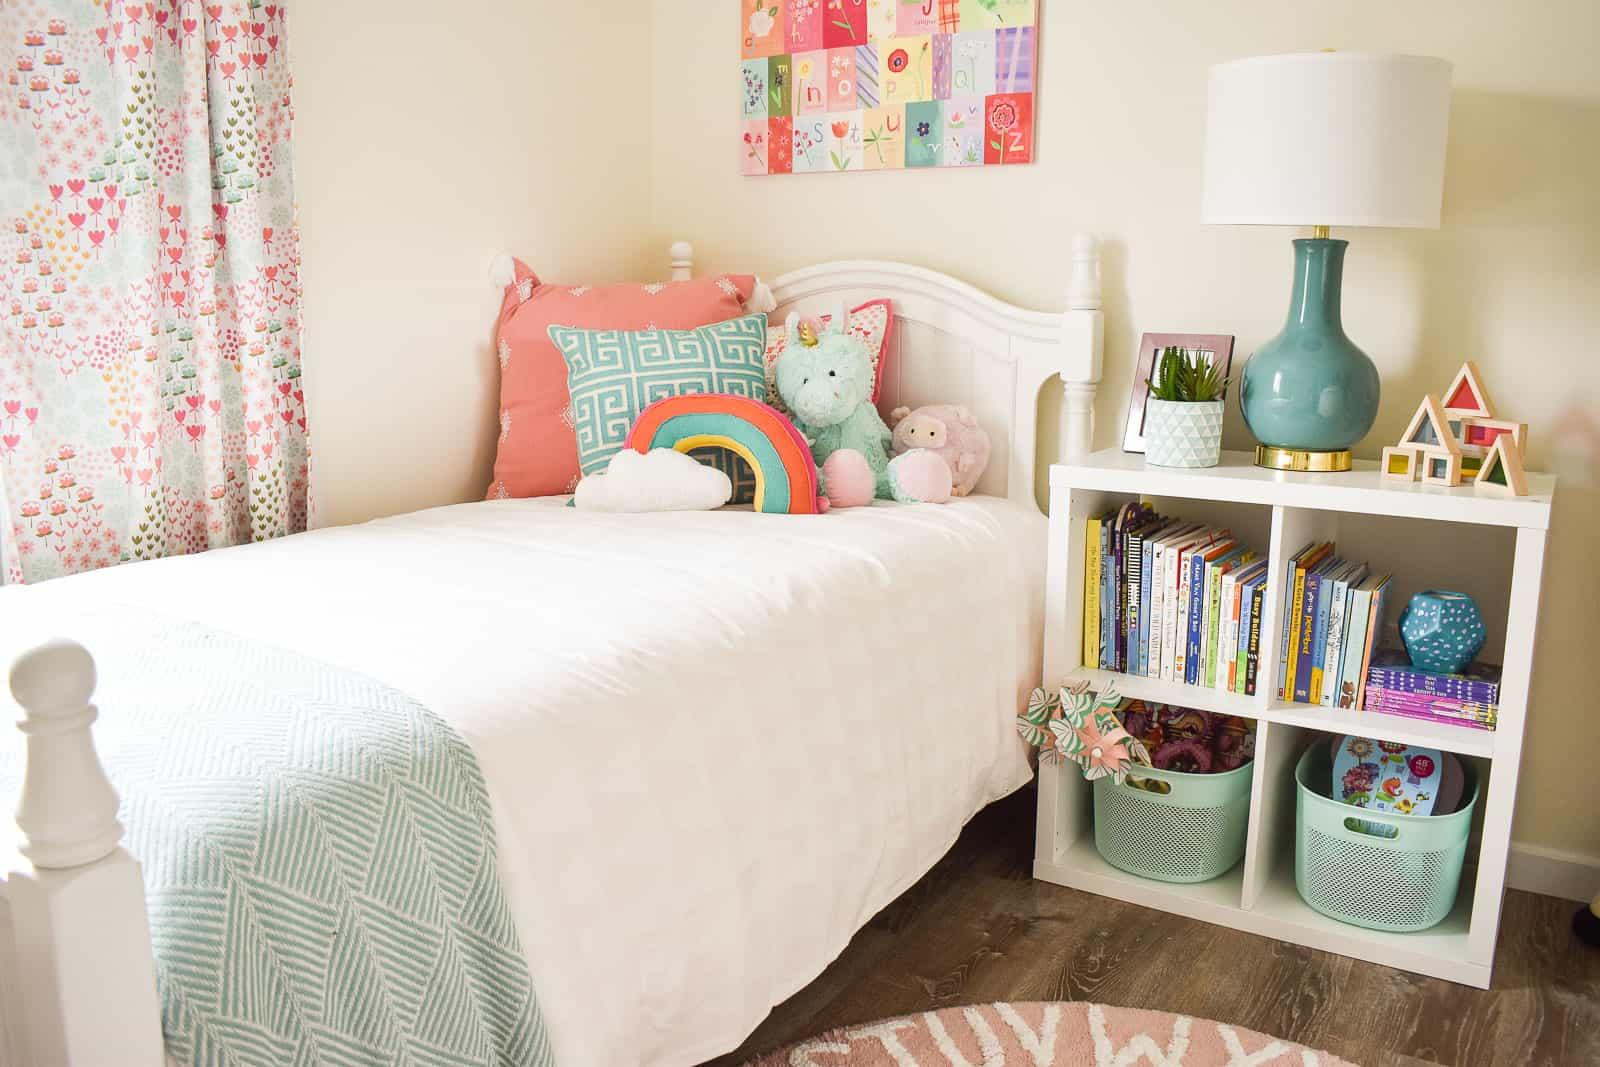 Image result for girl bedroom transformation free image